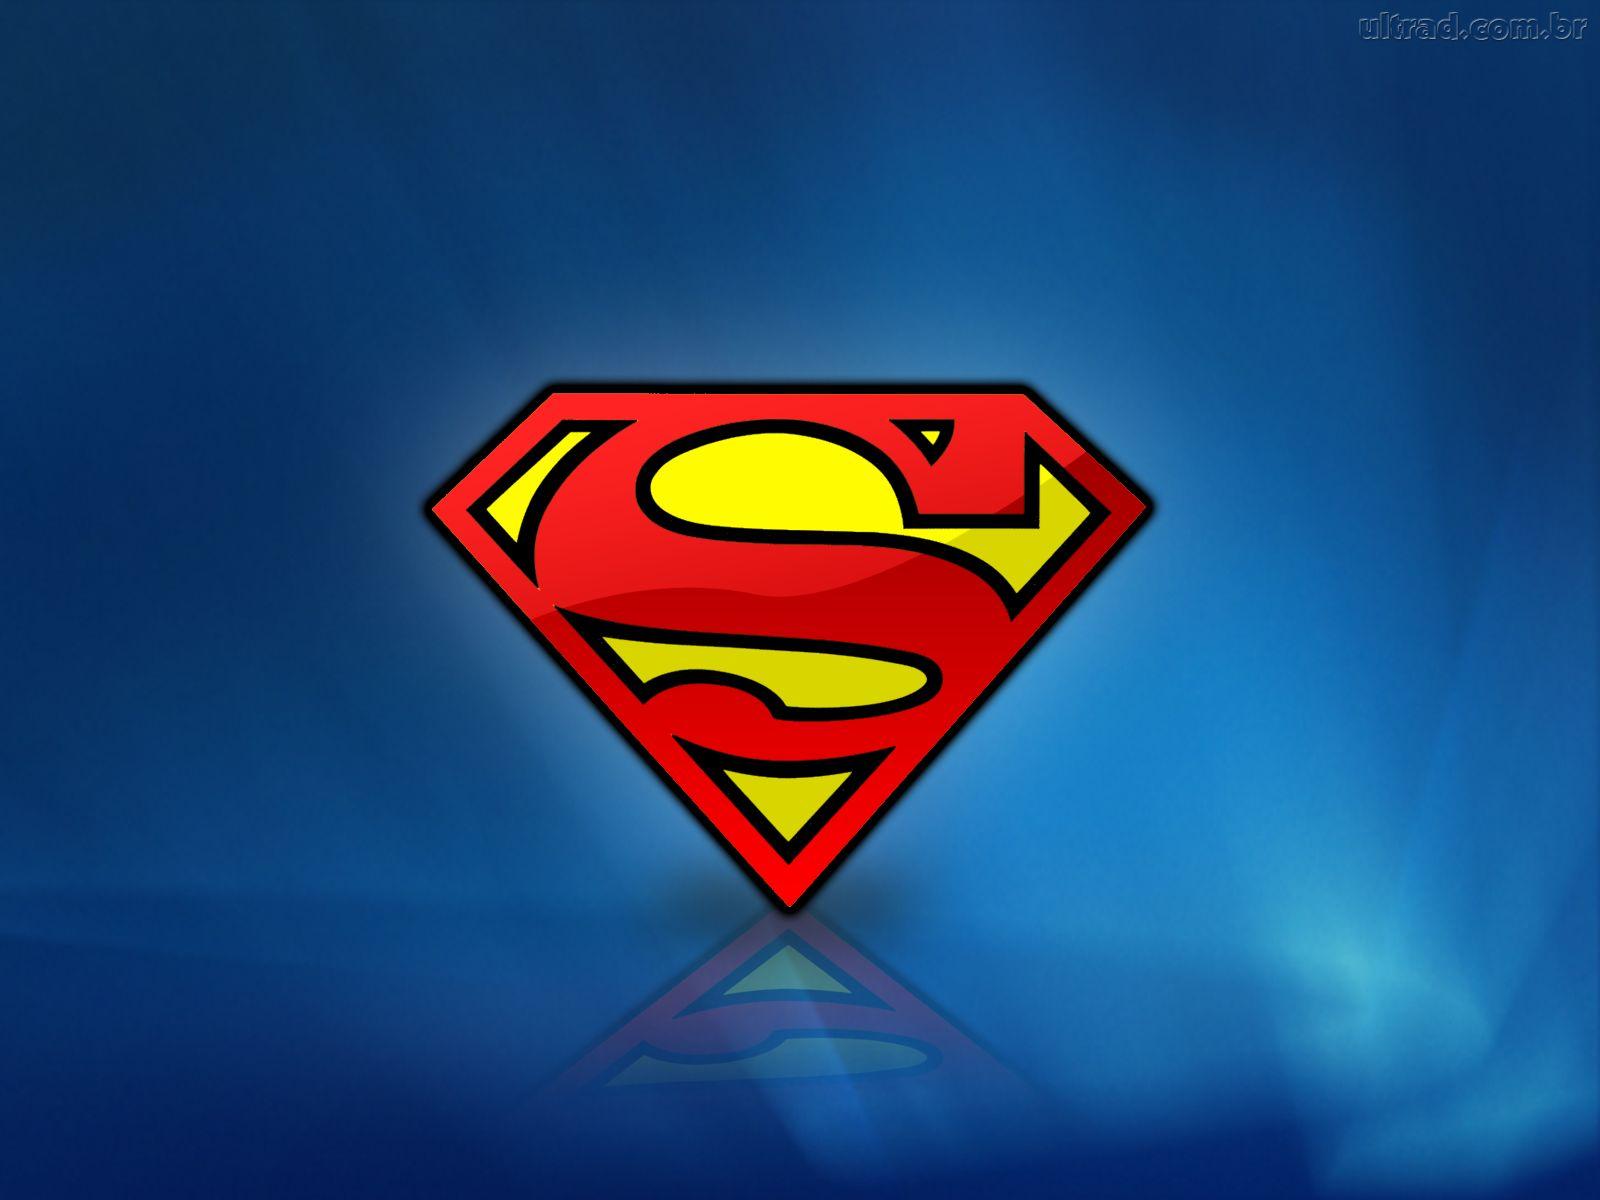 Superman Animated Wallpaper La Historia De Superman Social Geek